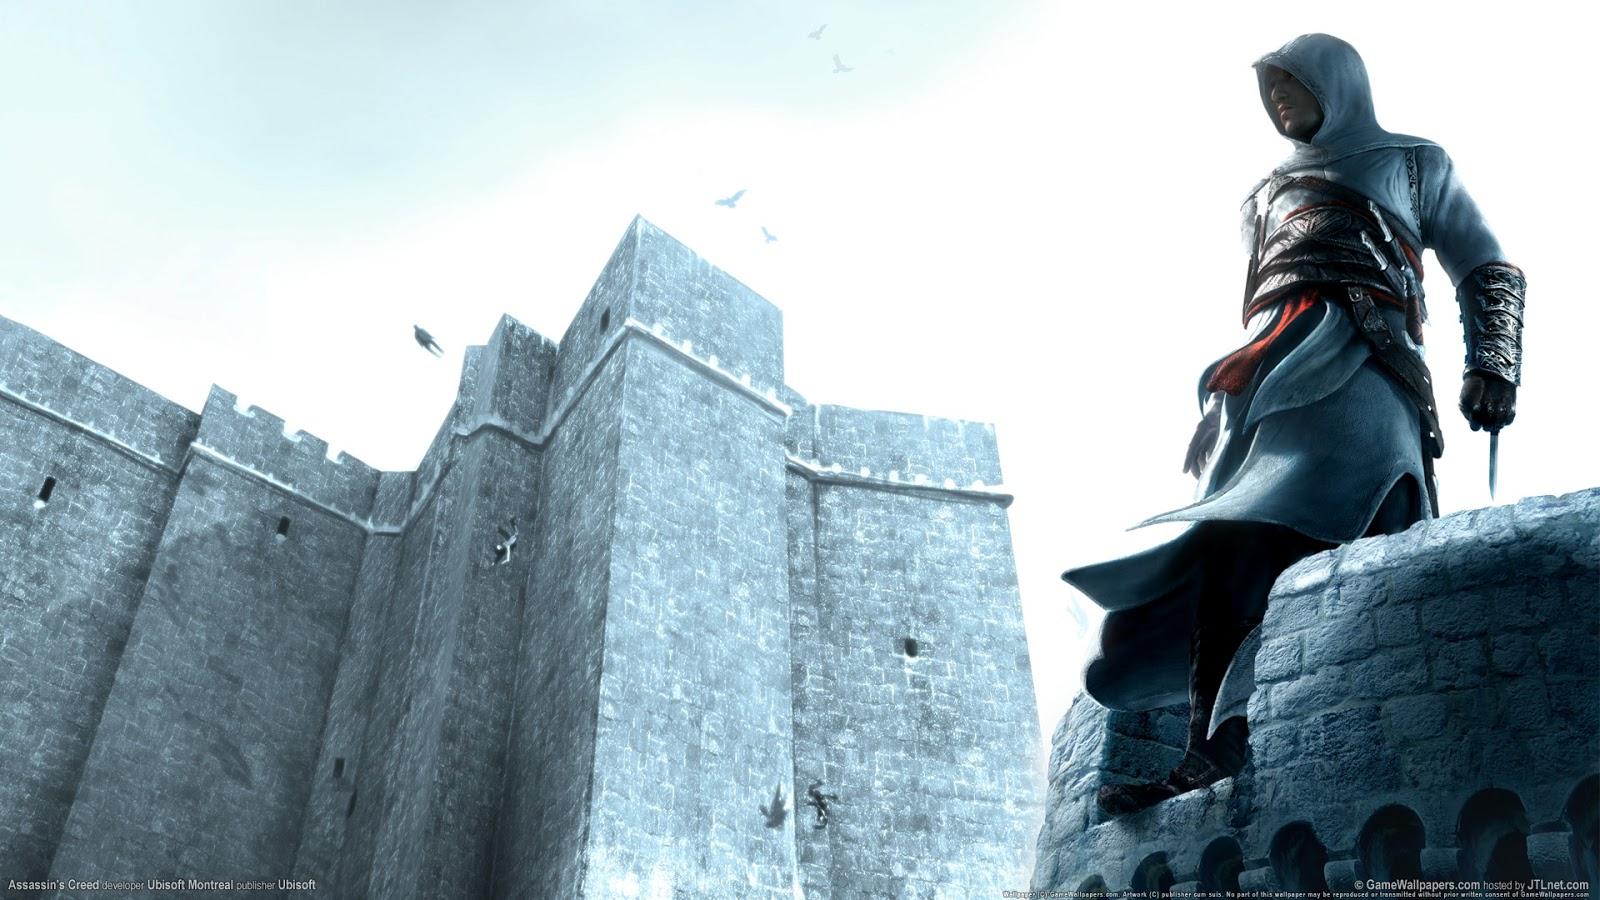 Wallpaper Dekstop Assassins Creed Brotherhood Game 1600x900